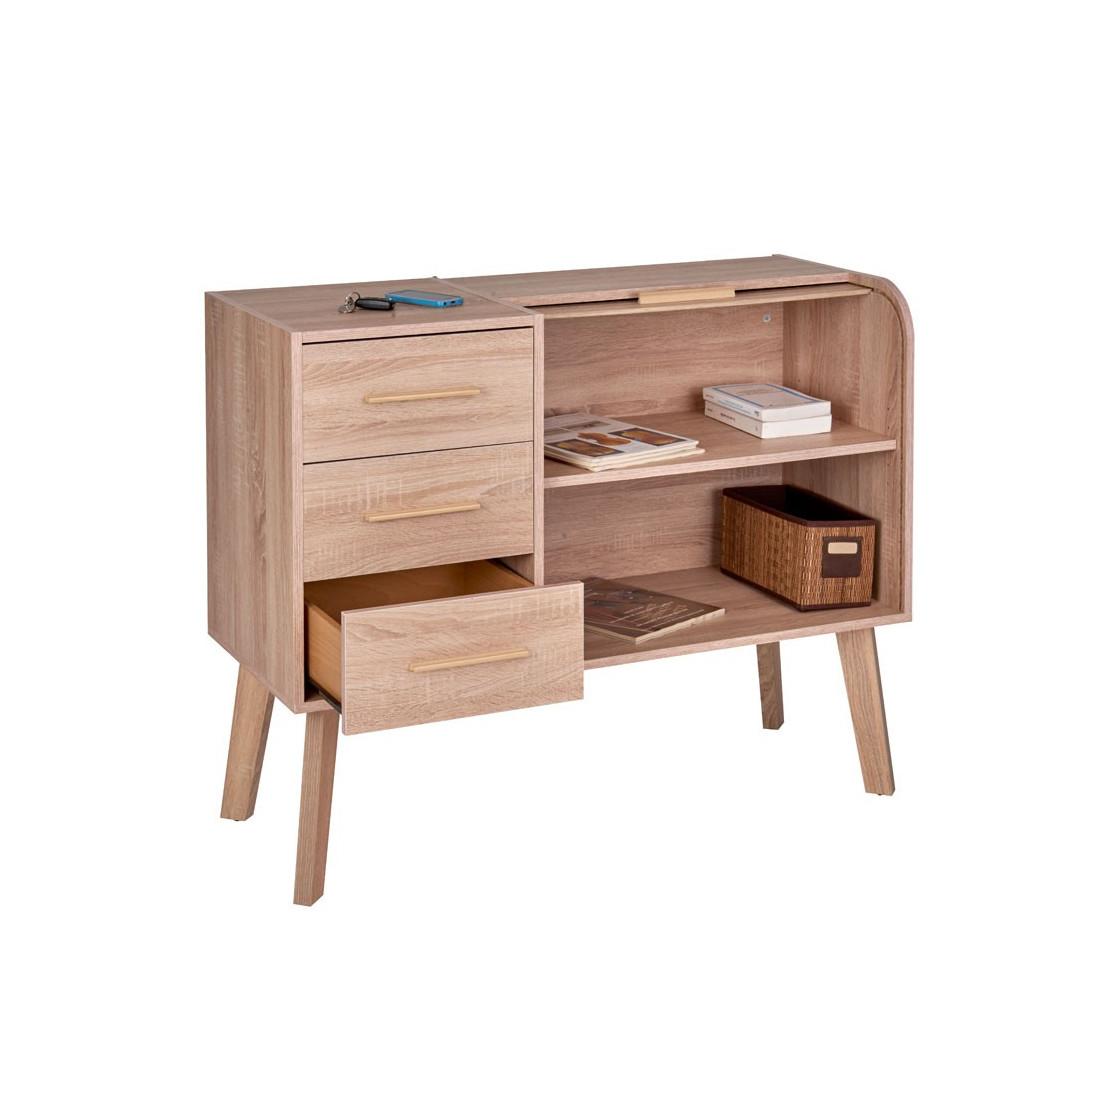 meuble d 39 entr e rideau 3 tiroirs arkos n 9 univers petits meubles. Black Bedroom Furniture Sets. Home Design Ideas